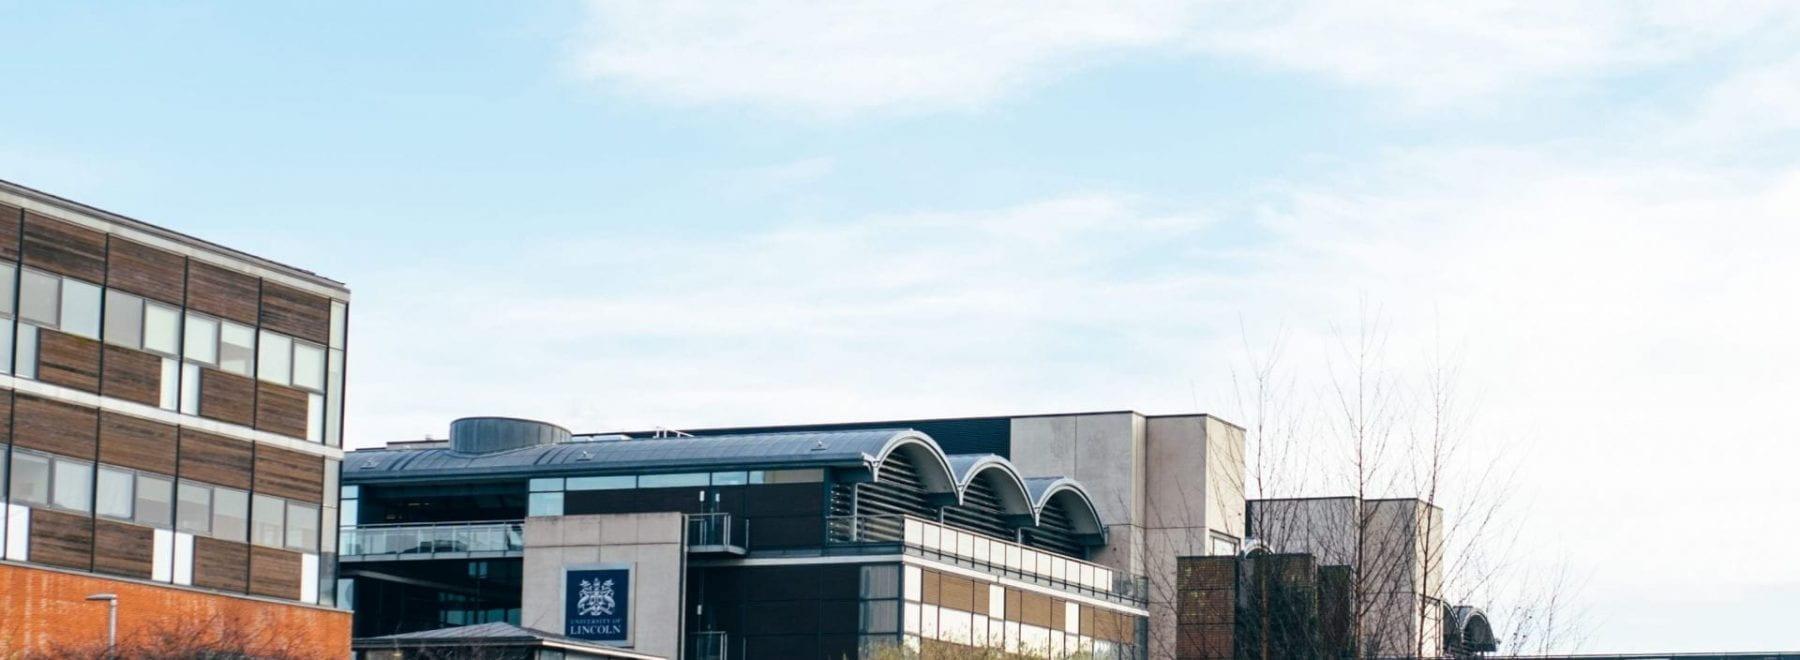 view of university